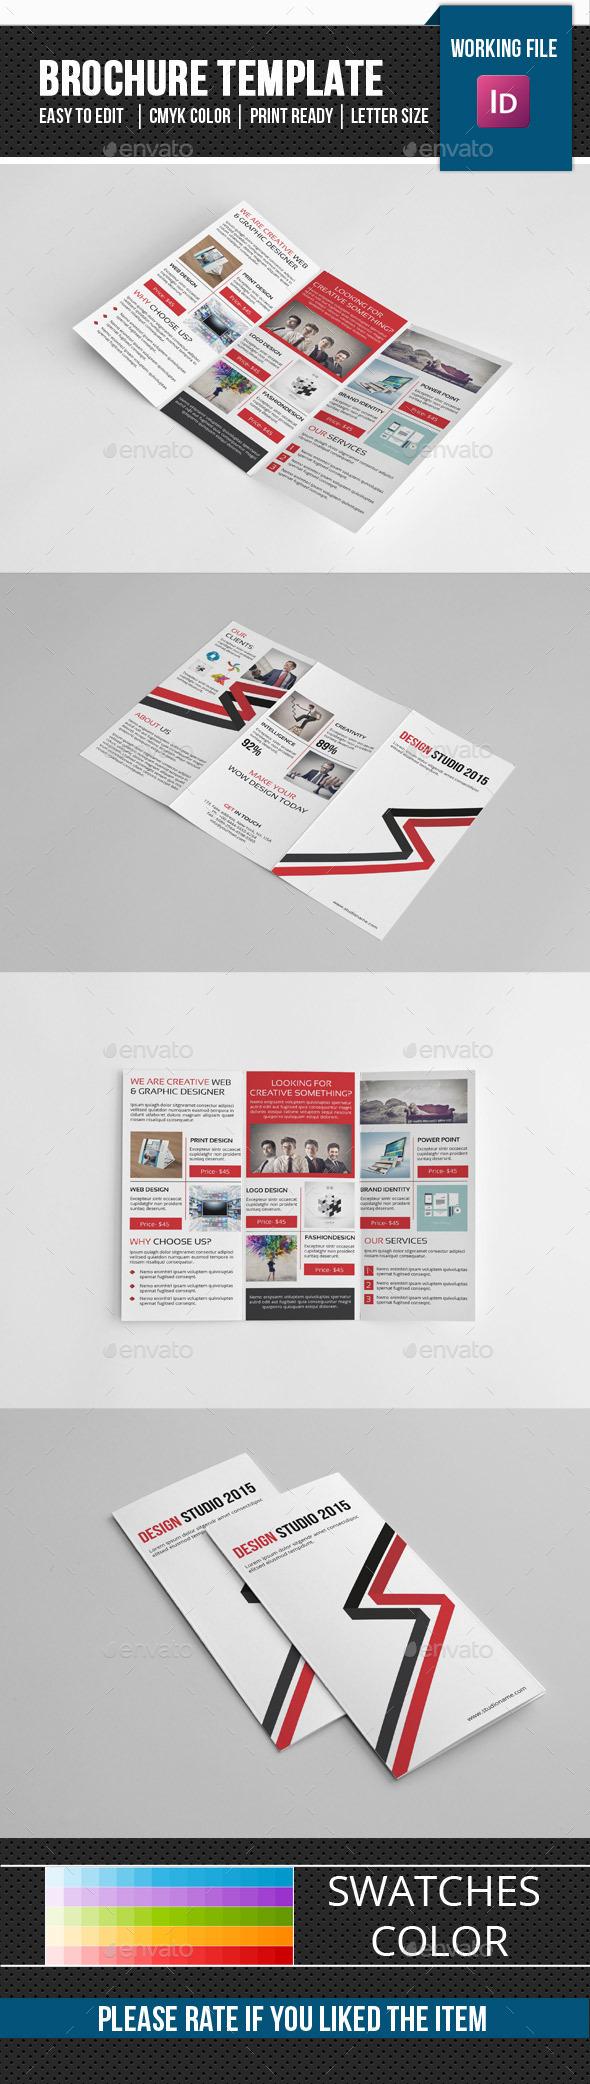 Design Studio Trifold Brochure-V244 - Corporate Brochures